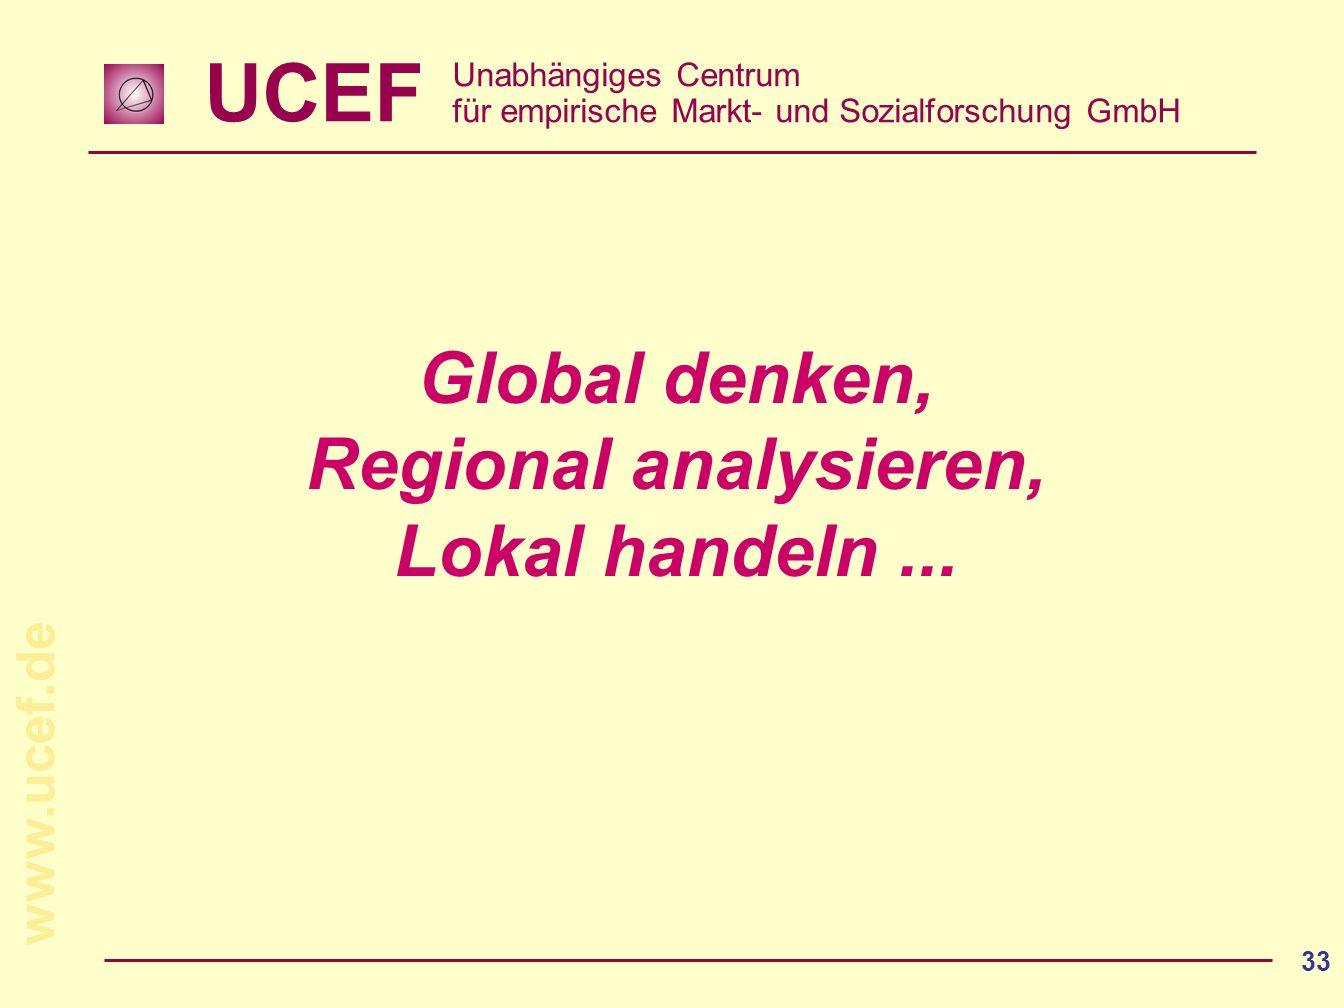 Global denken, Regional analysieren, Lokal handeln ...